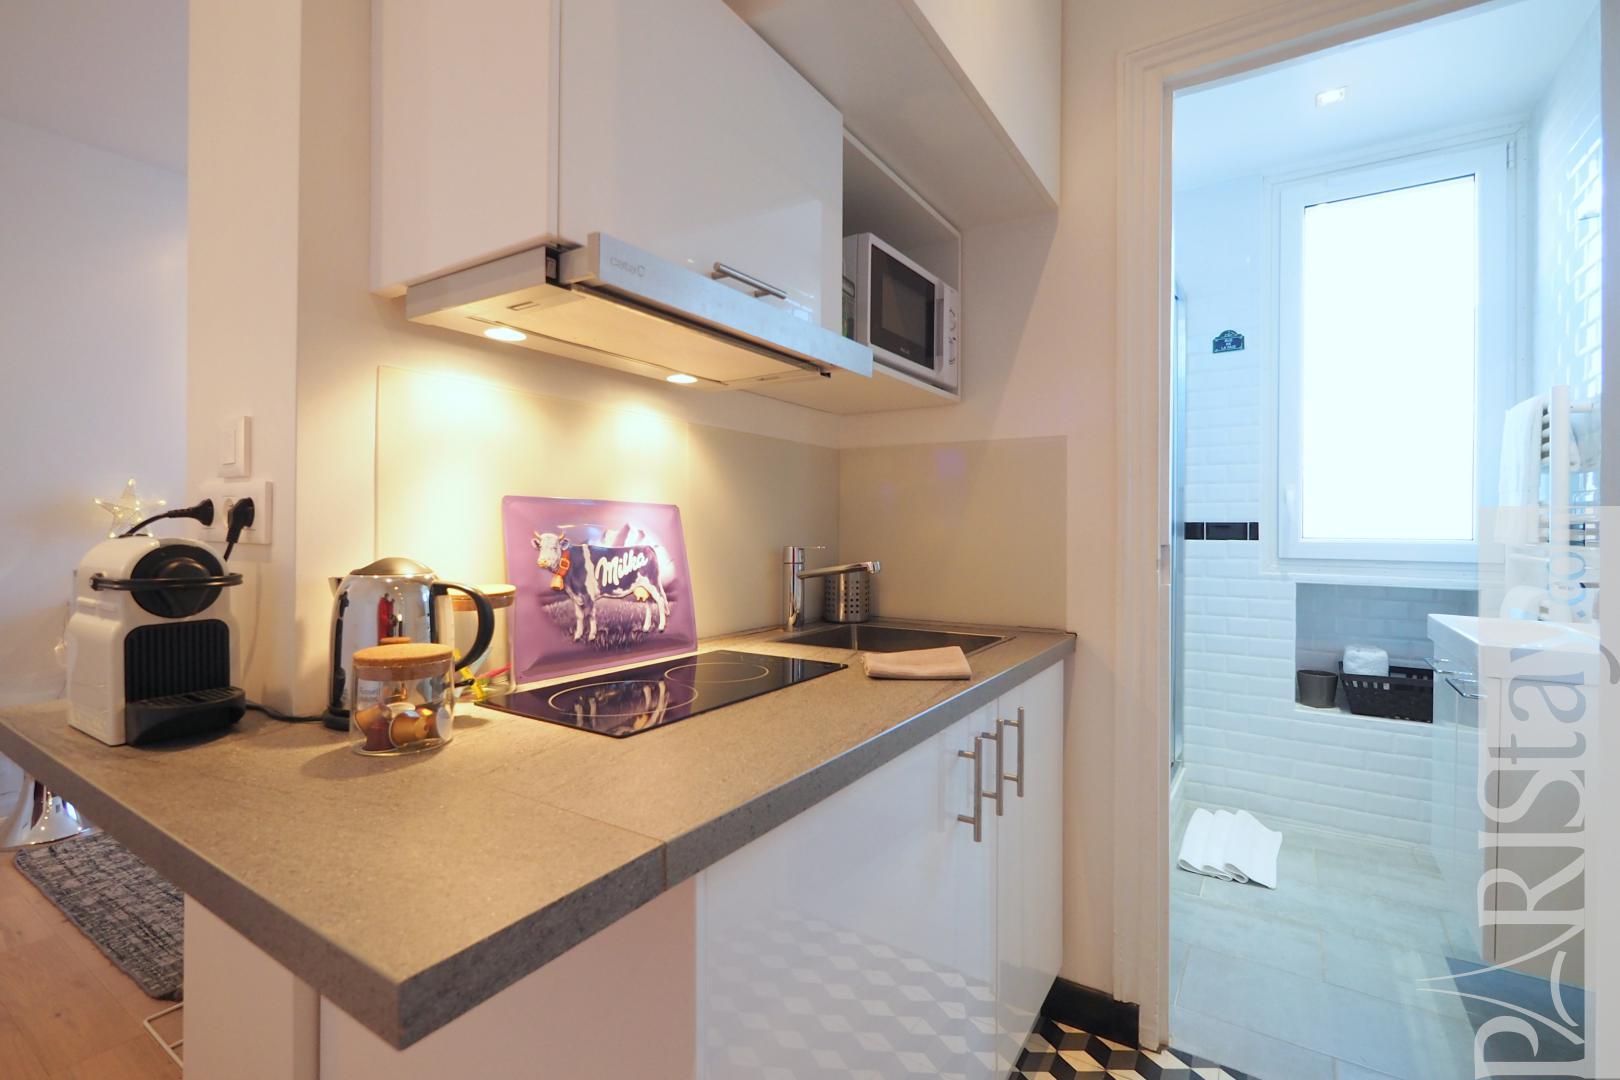 Paris location appartement courte duree studio republique for Location meuble courte duree paris